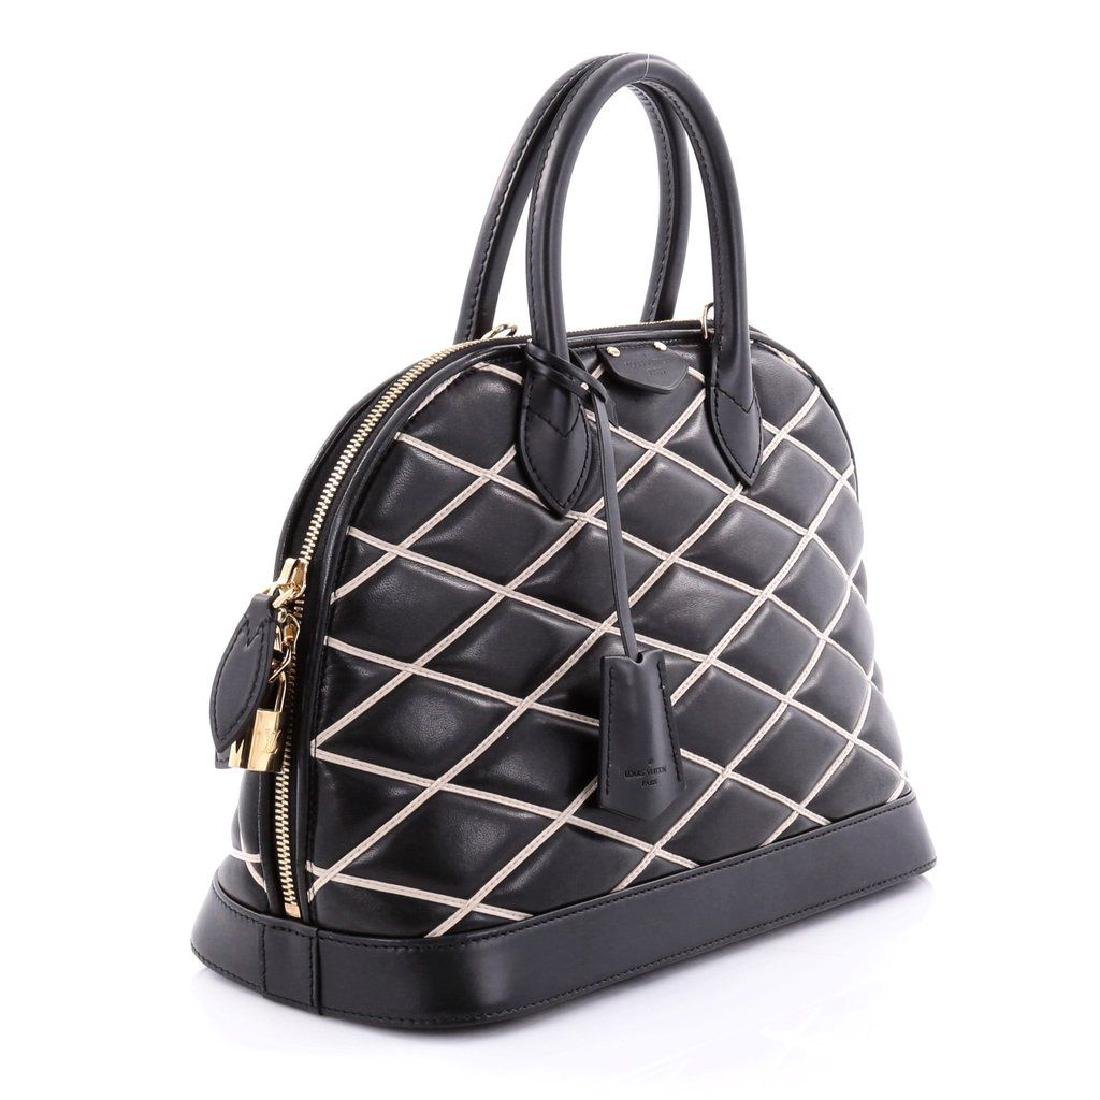 Limited Edition Louis Vuitton Black Diamond Alma PM - 2